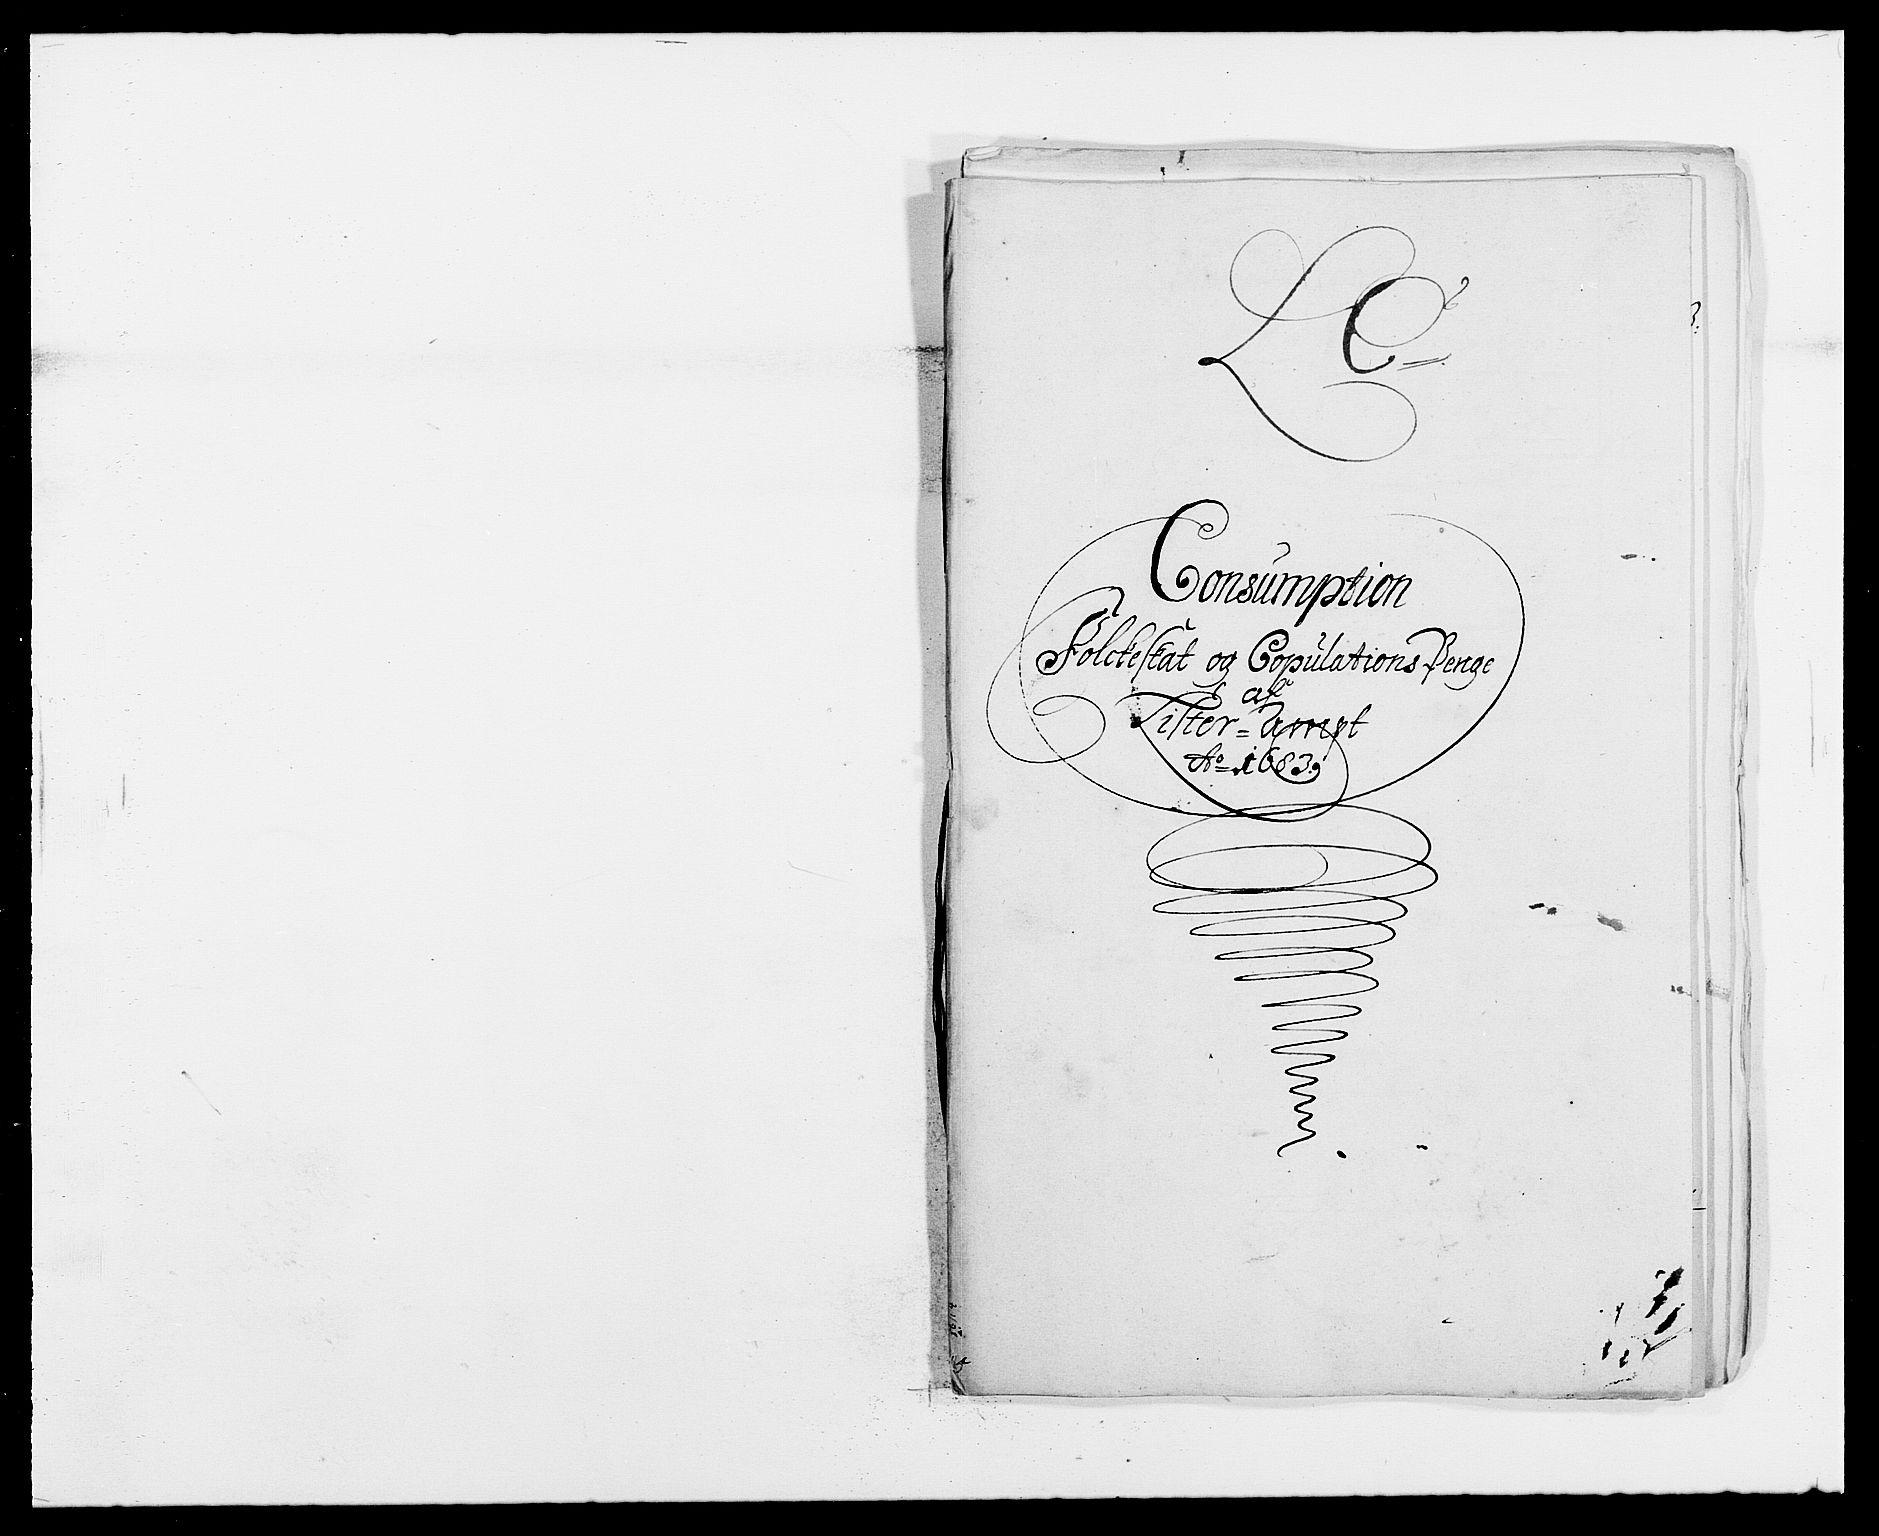 RA, Rentekammeret inntil 1814, Reviderte regnskaper, Fogderegnskap, R41/L2532: Fogderegnskap Lista, 1683, s. 77